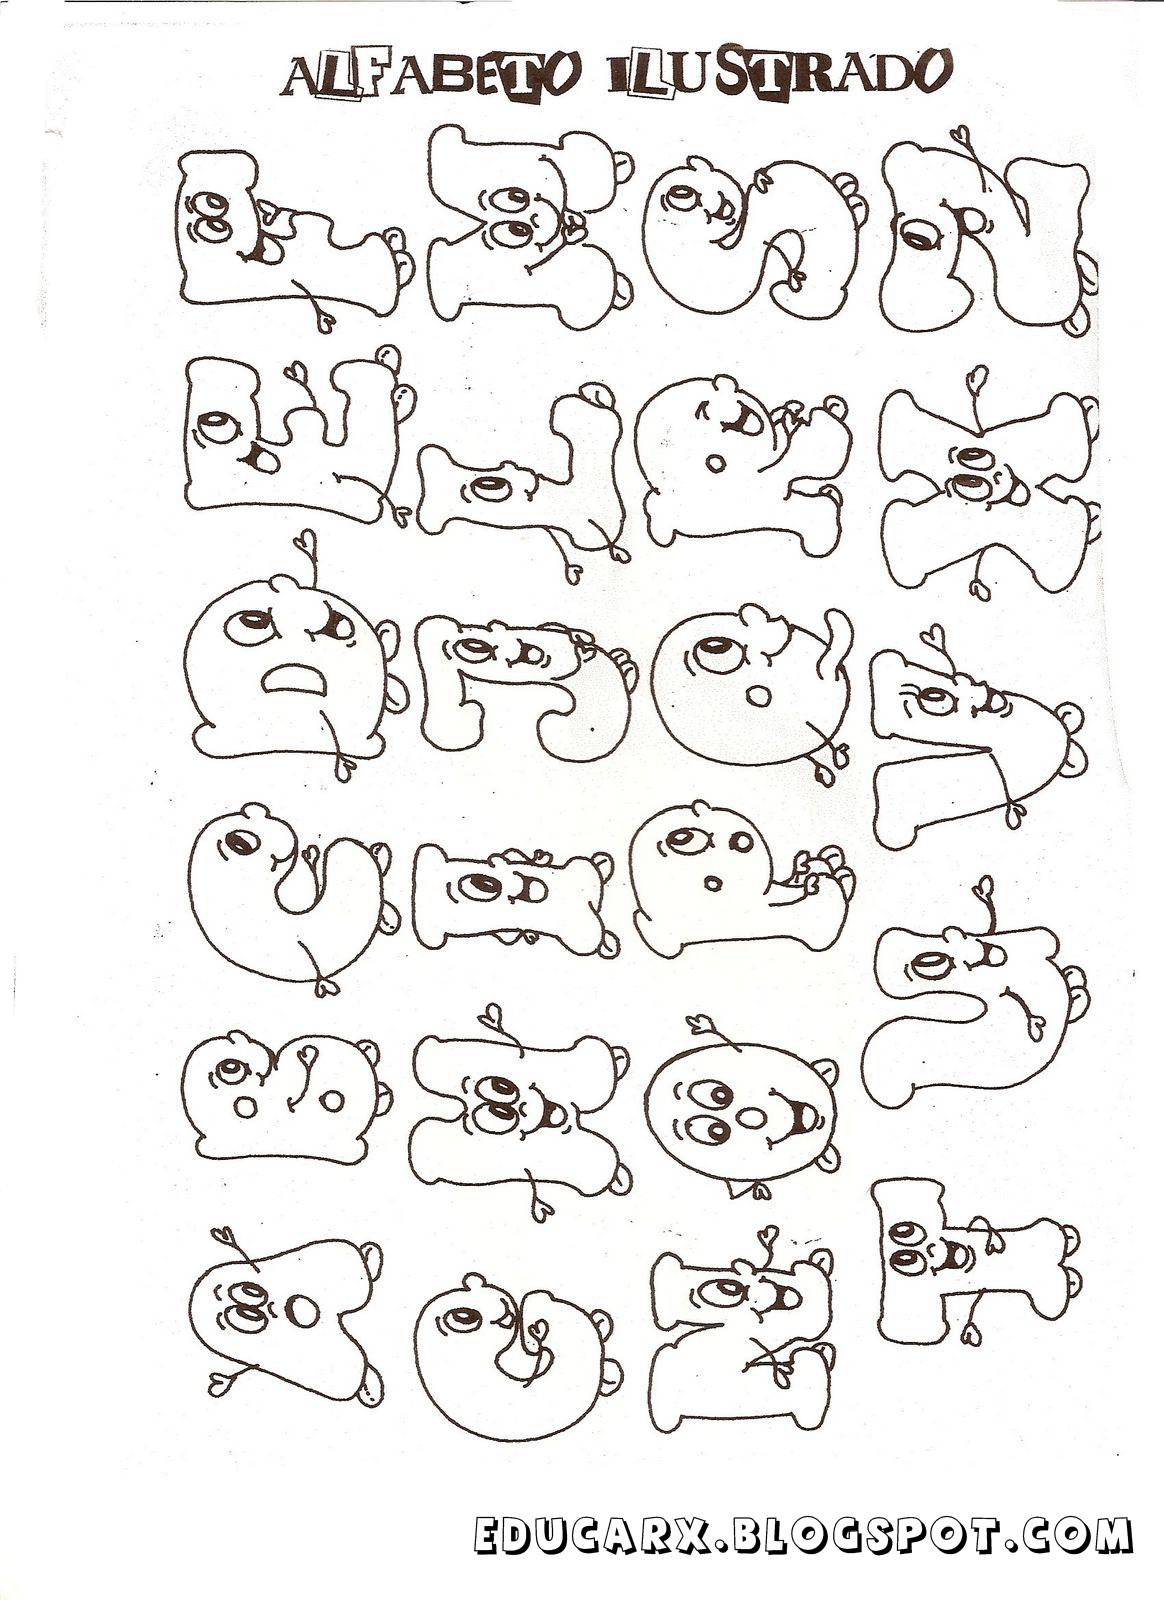 Modelo de letras alfabeto ilustrado